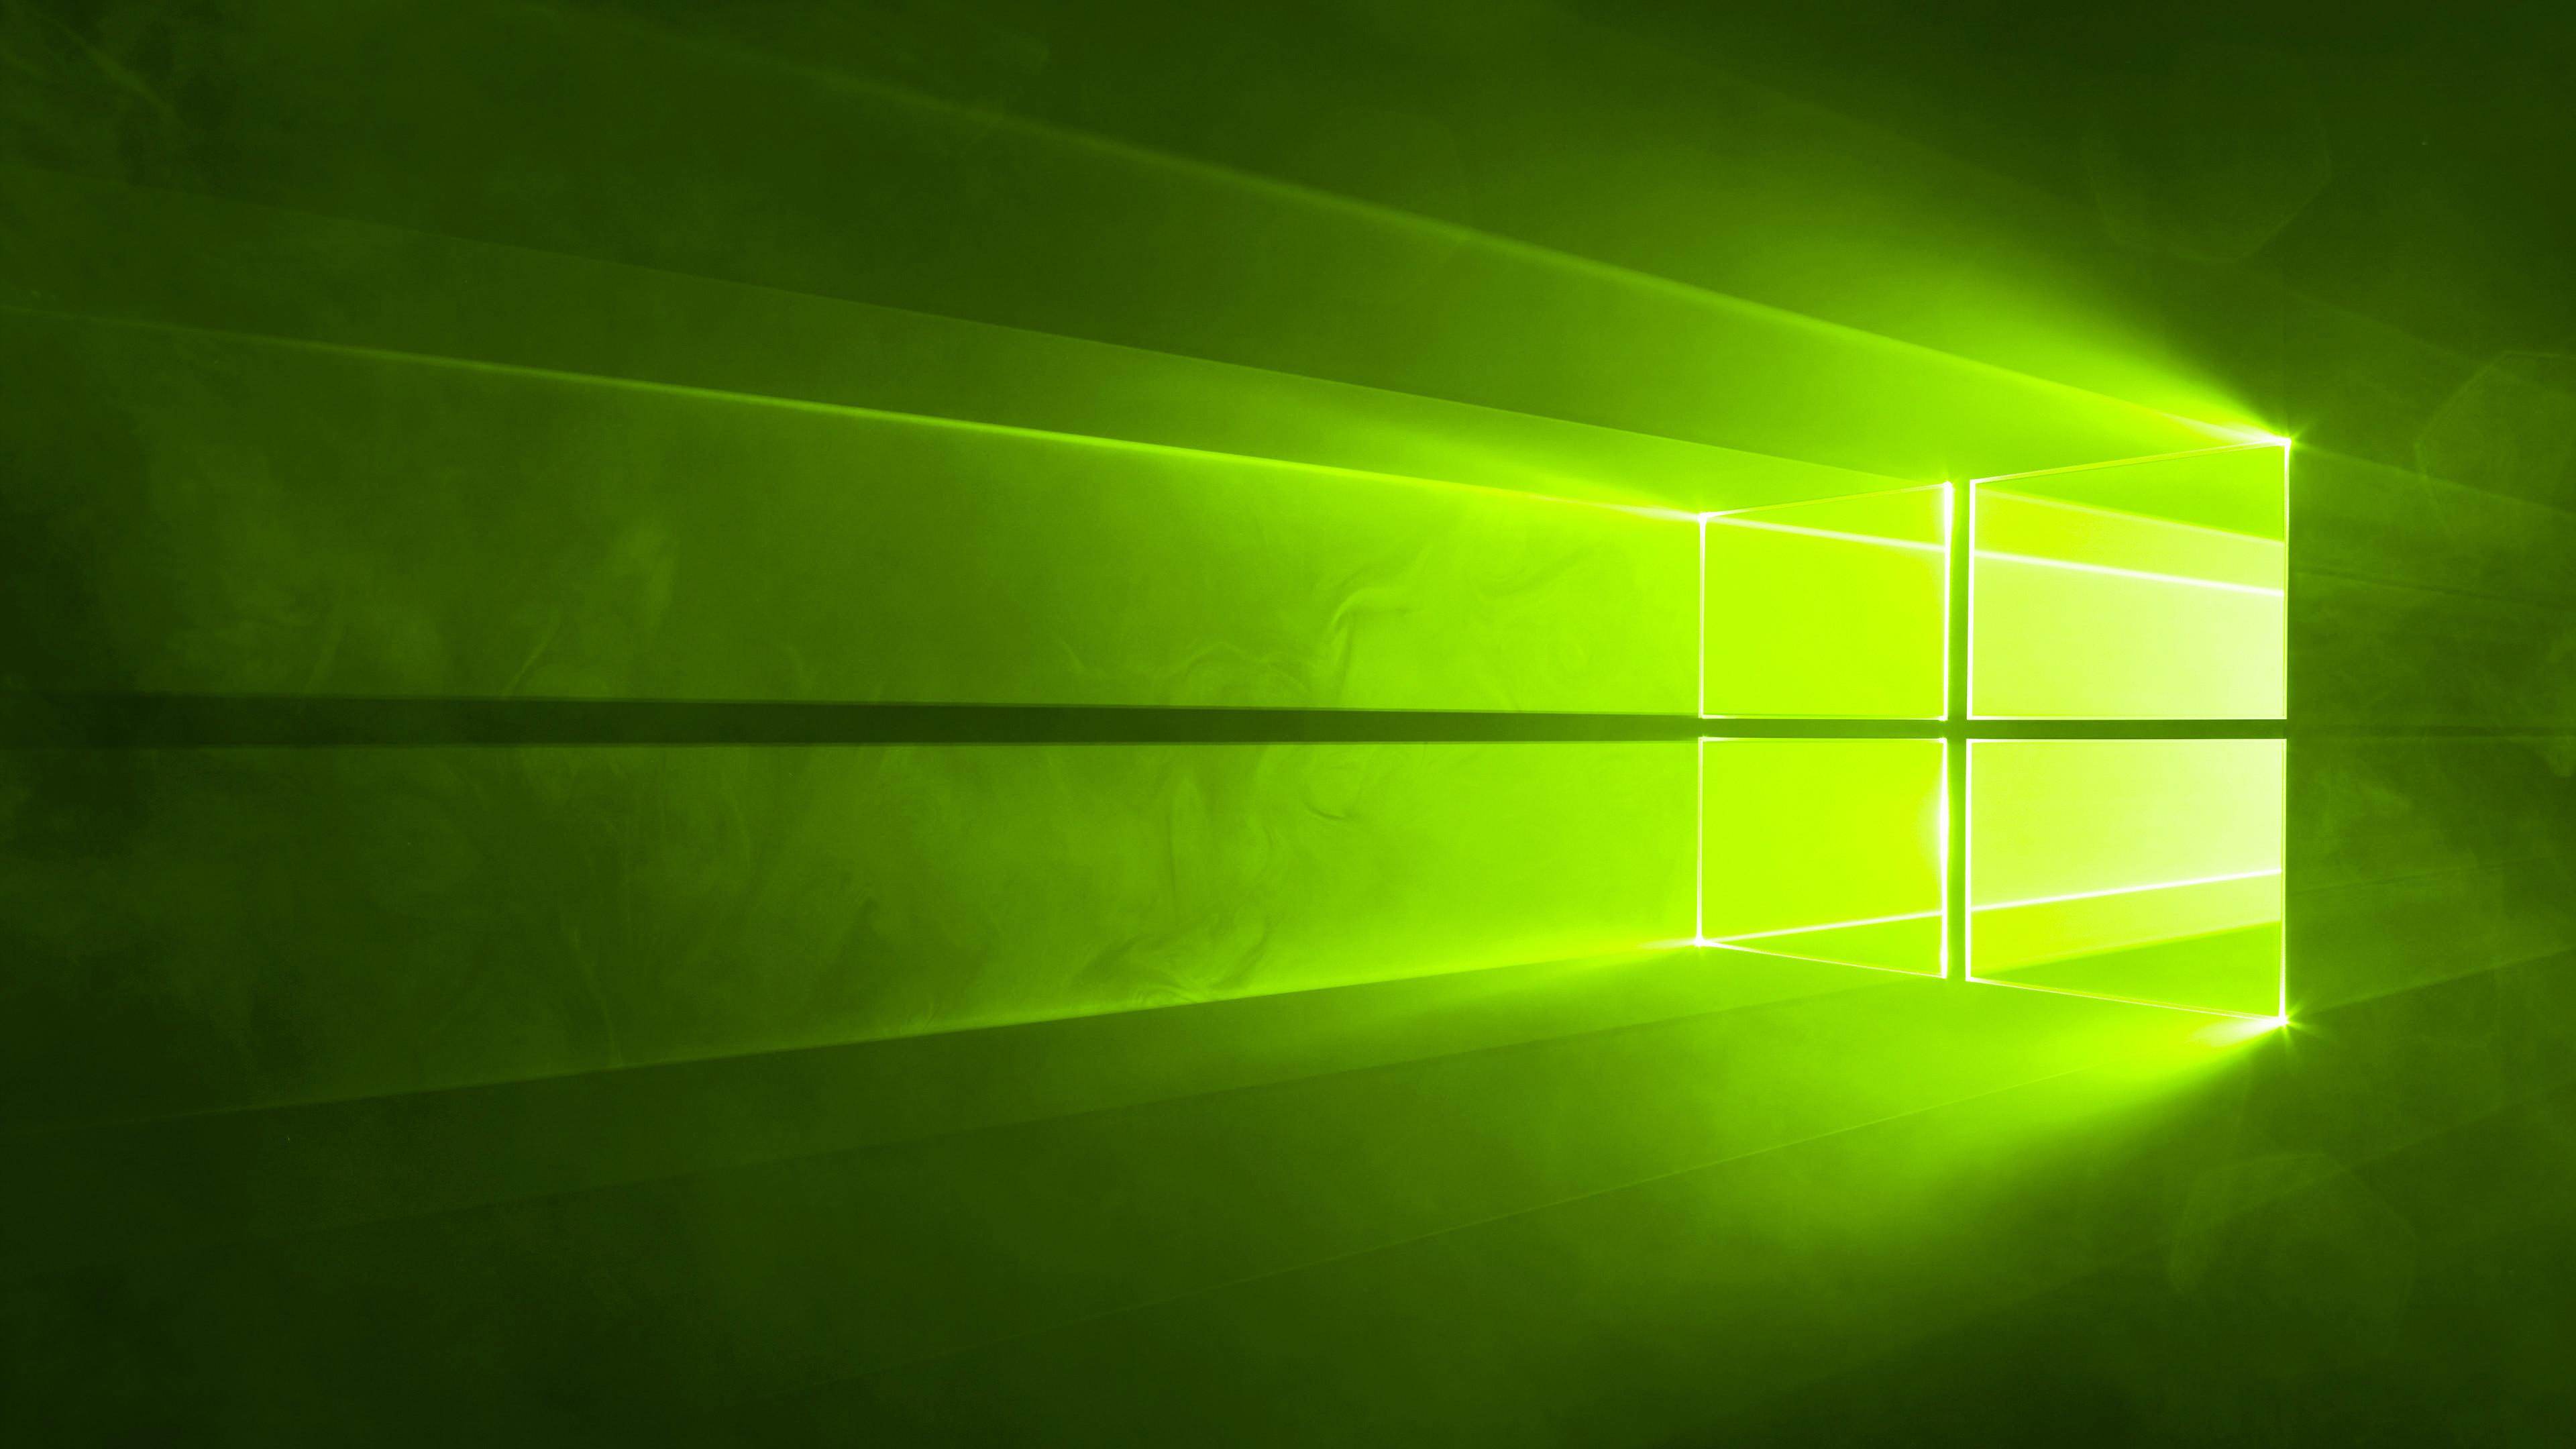 Windows 10 Sfondi 82 Immagini